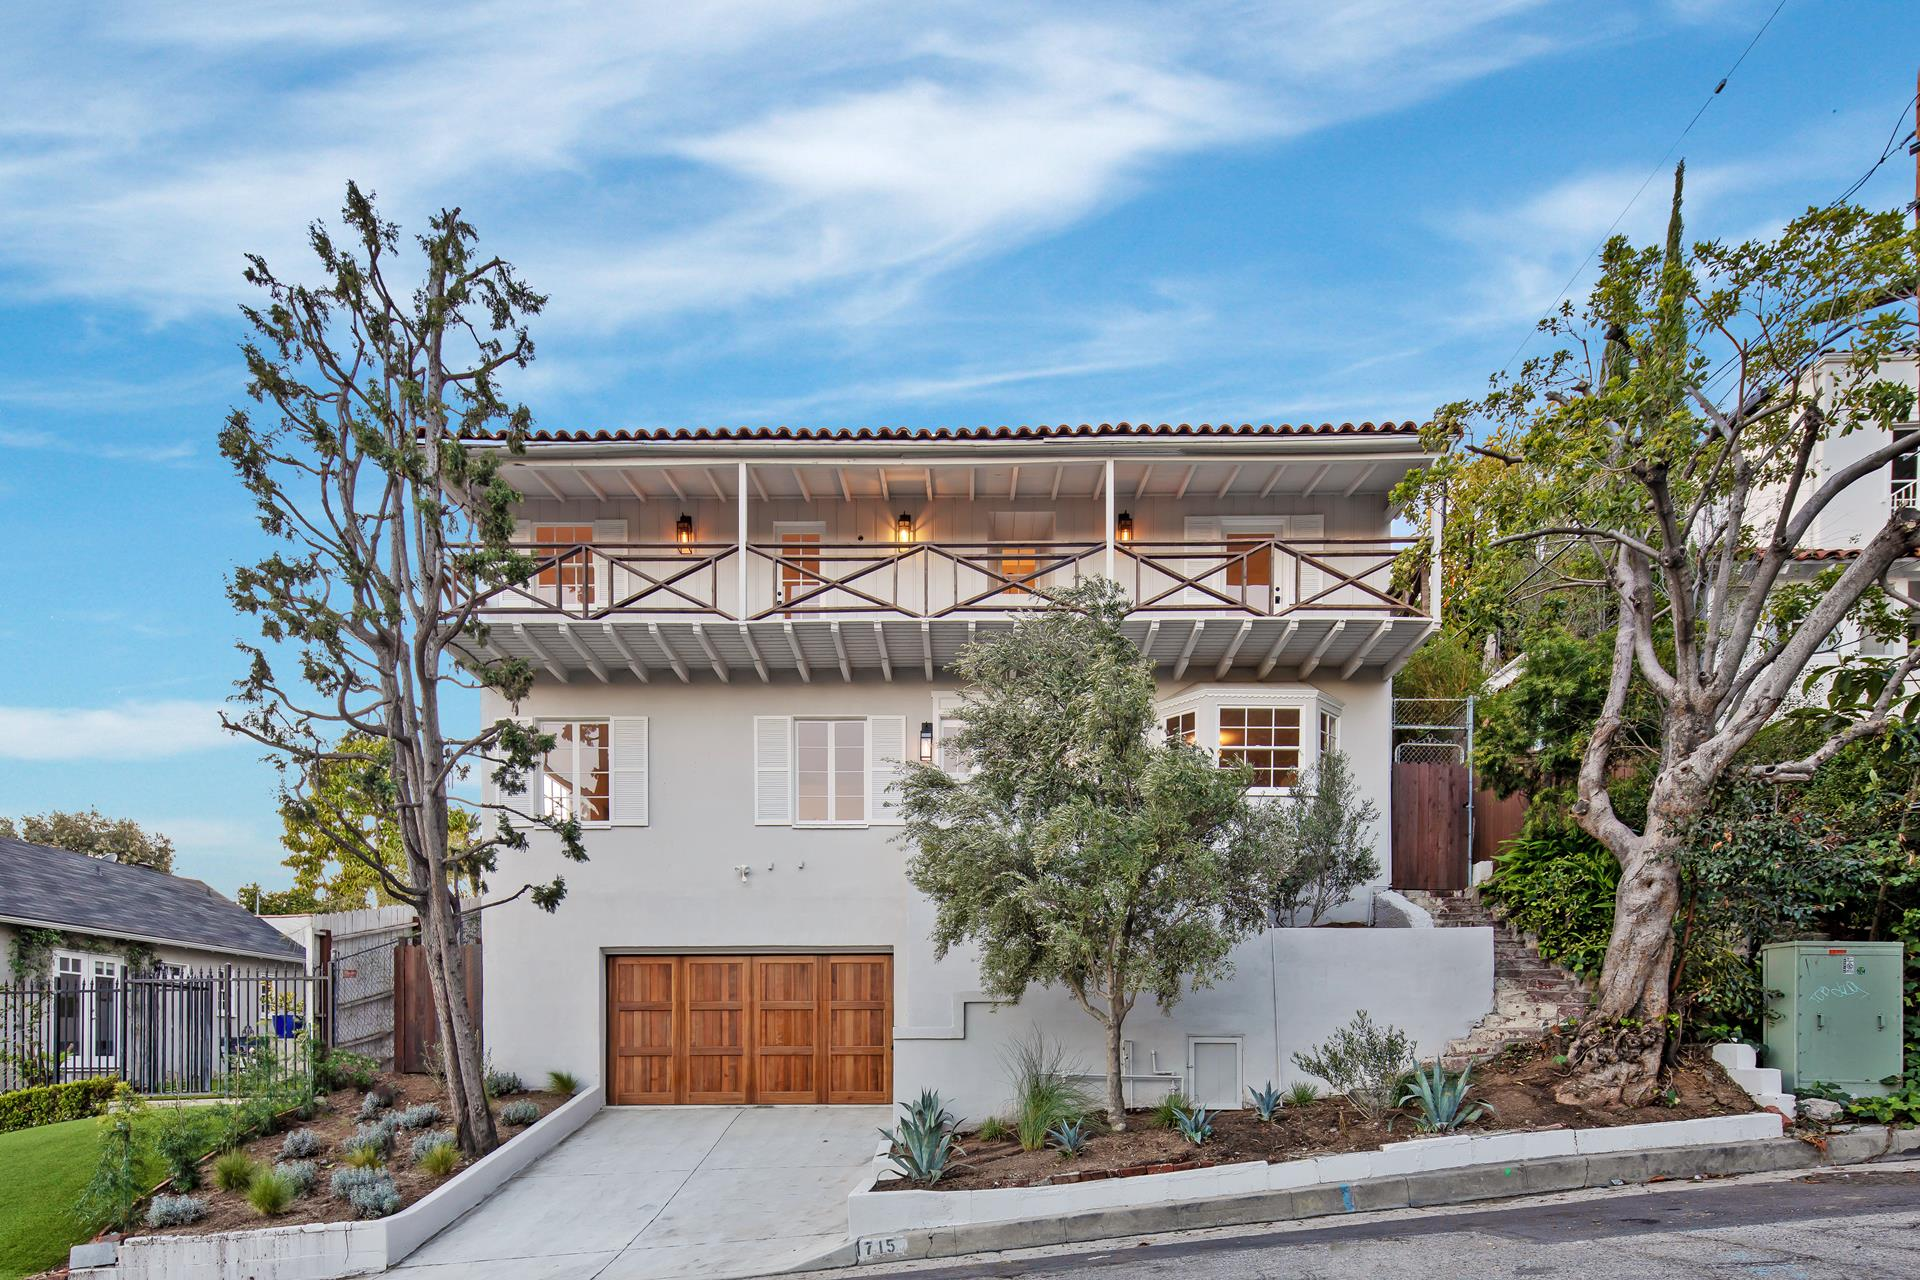 1715 N FAIRFAX Avenue - Sunset Strip / Hollywood Hills West, California